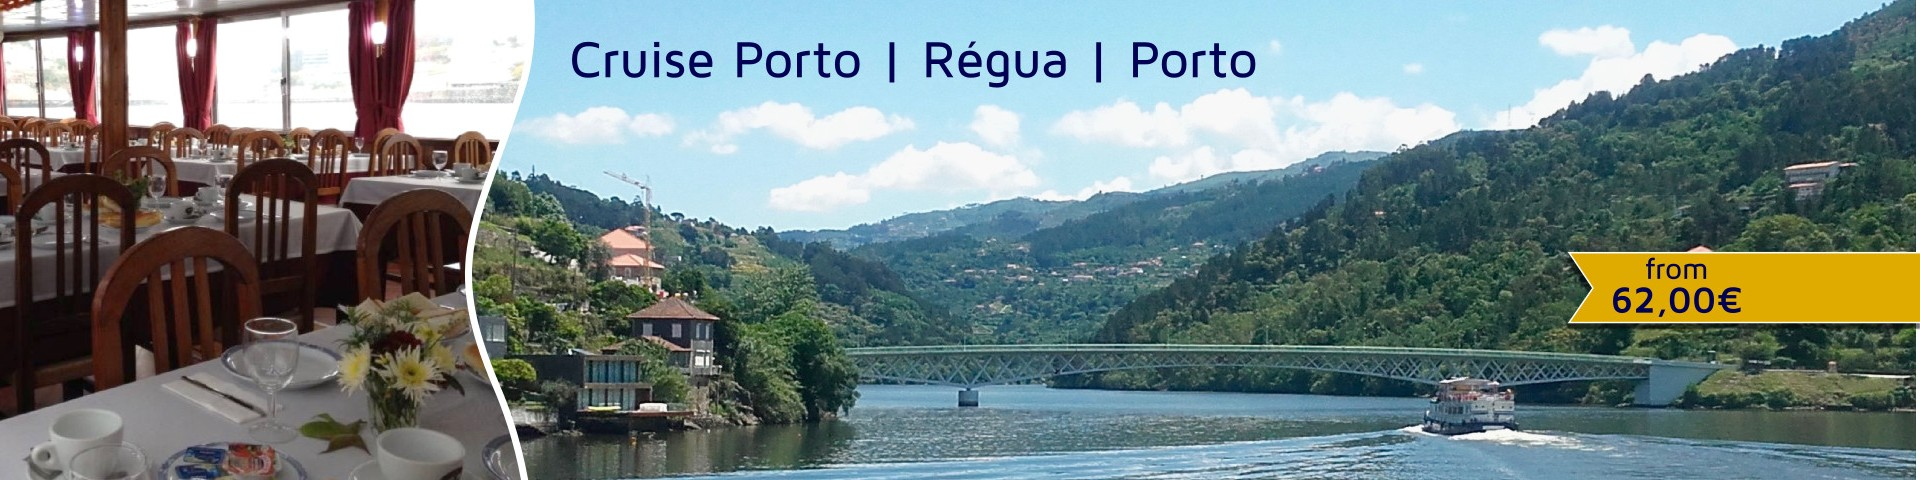 Cruise Porto Régua Porto